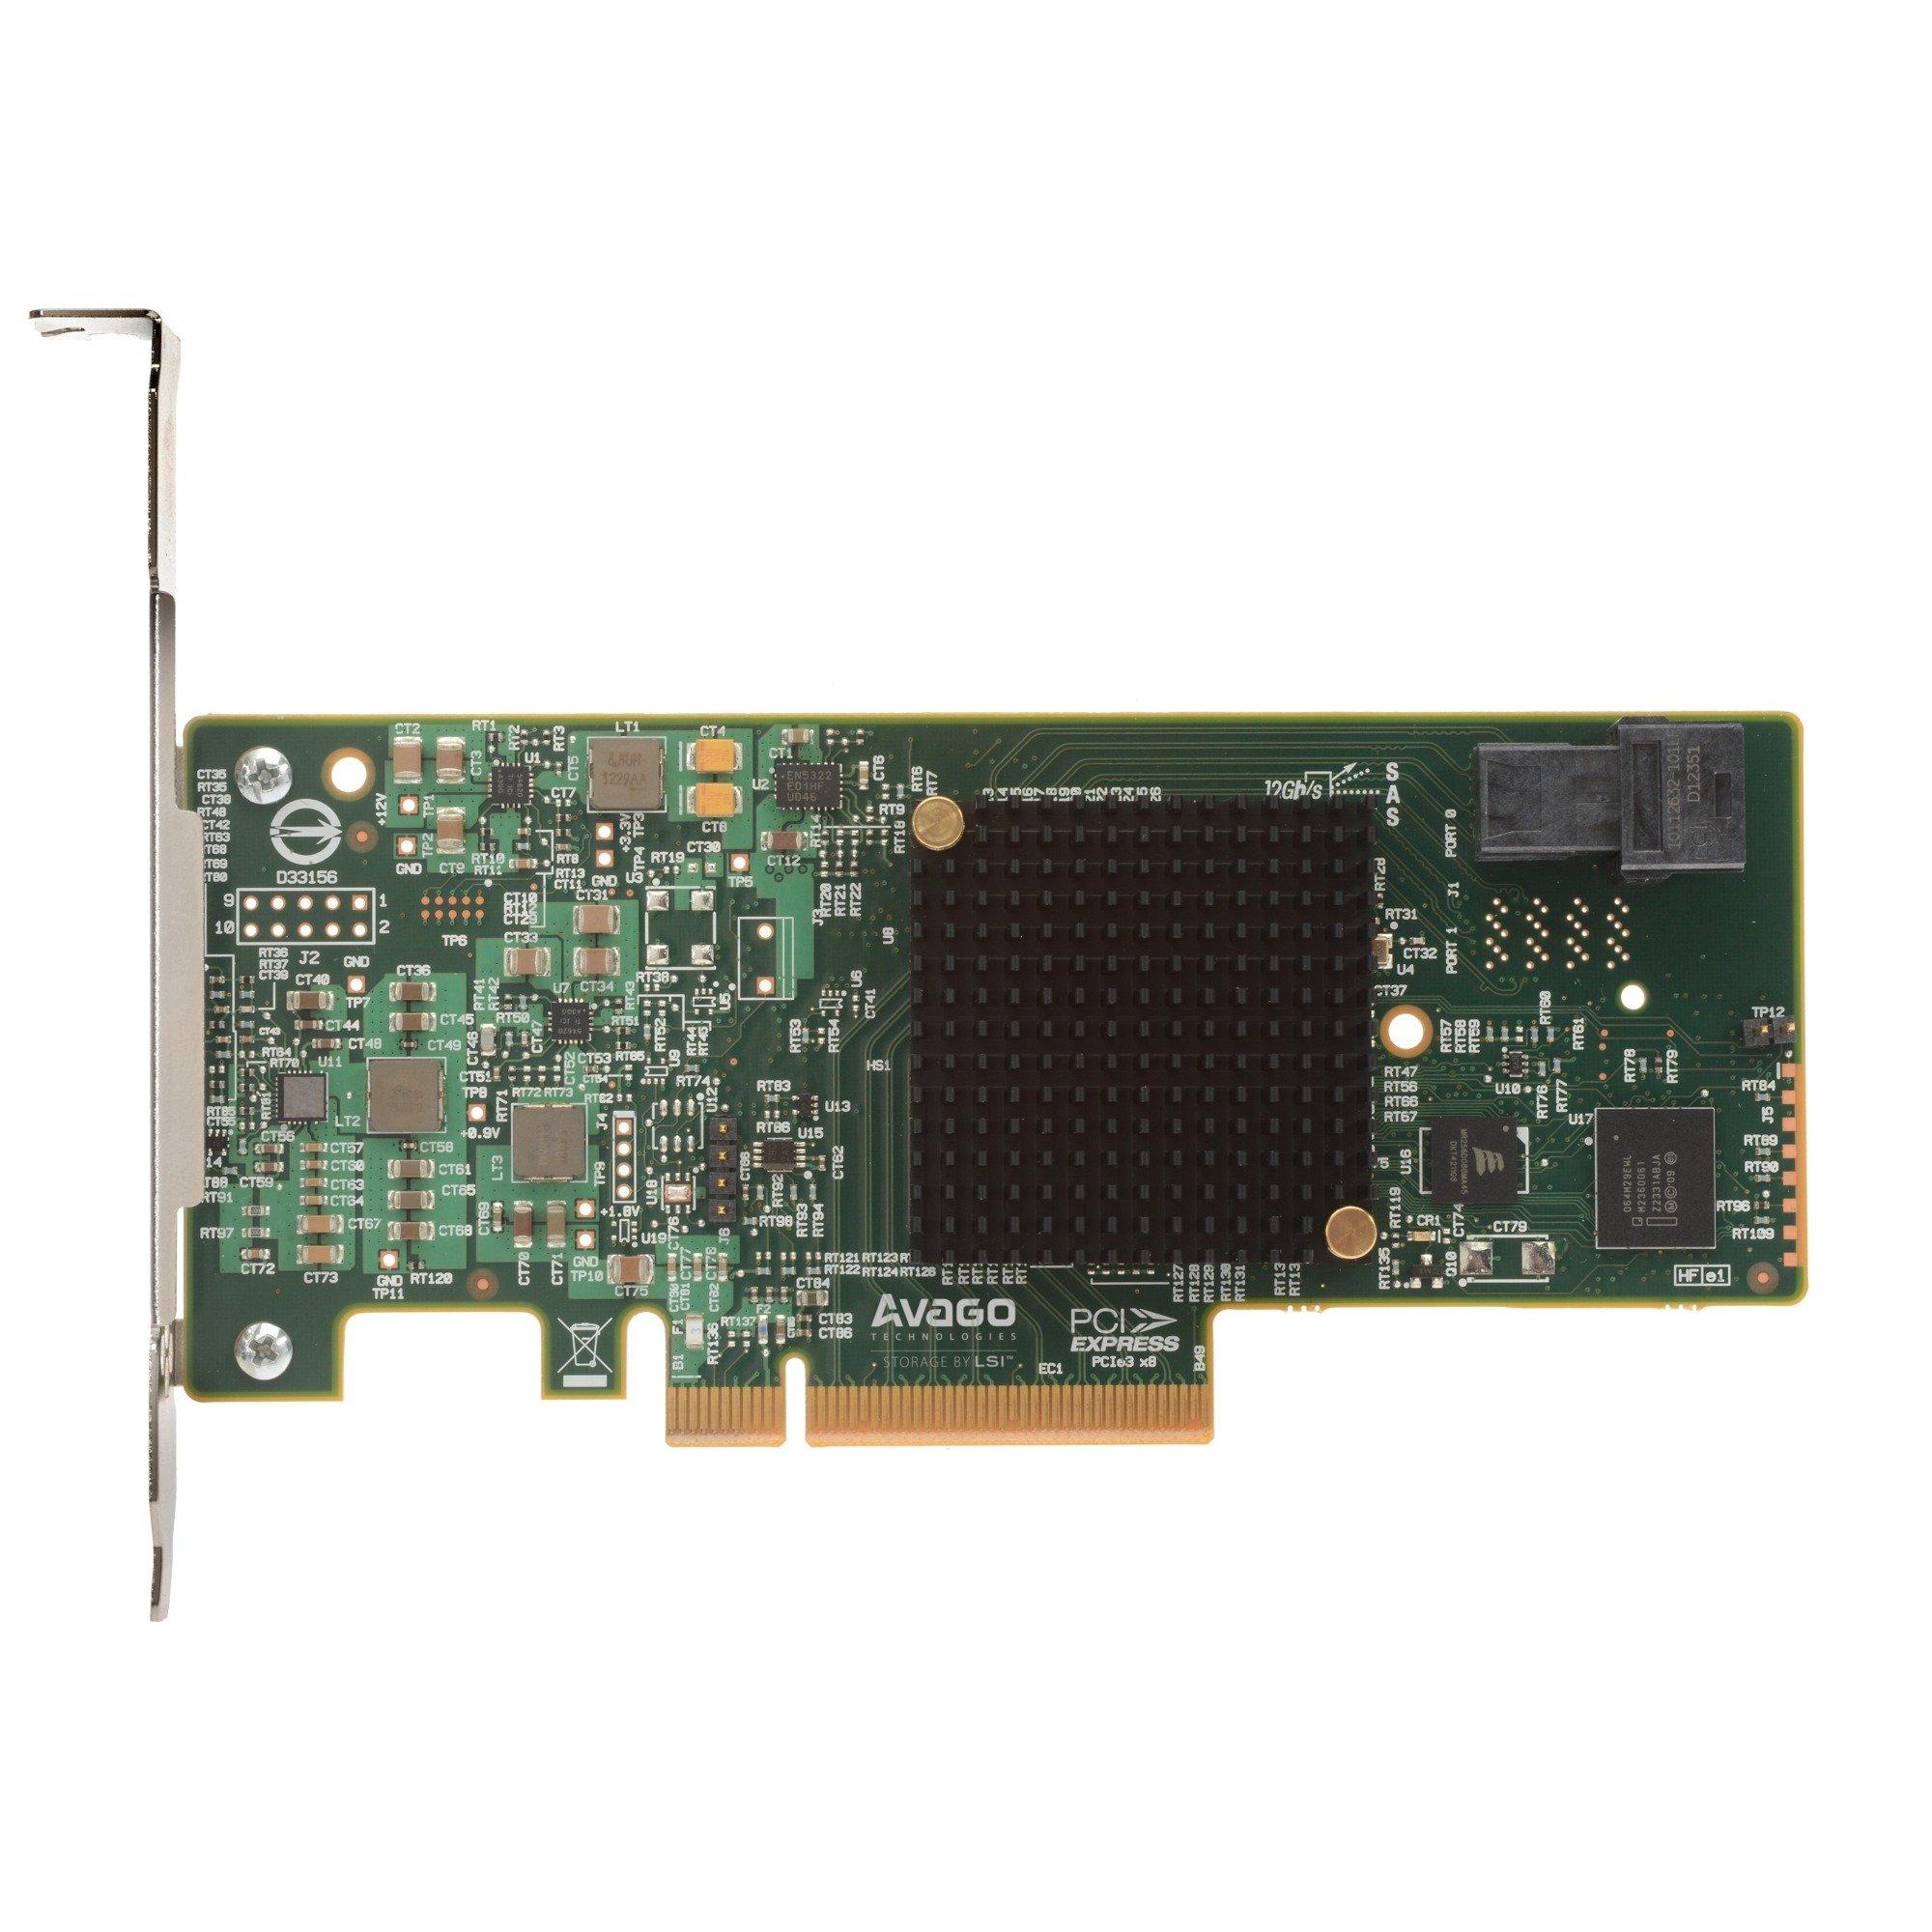 MegaRAID SAS 9341-4i controlado RAID PCI Express x8 3.0 12 Gbit/s, Controlador